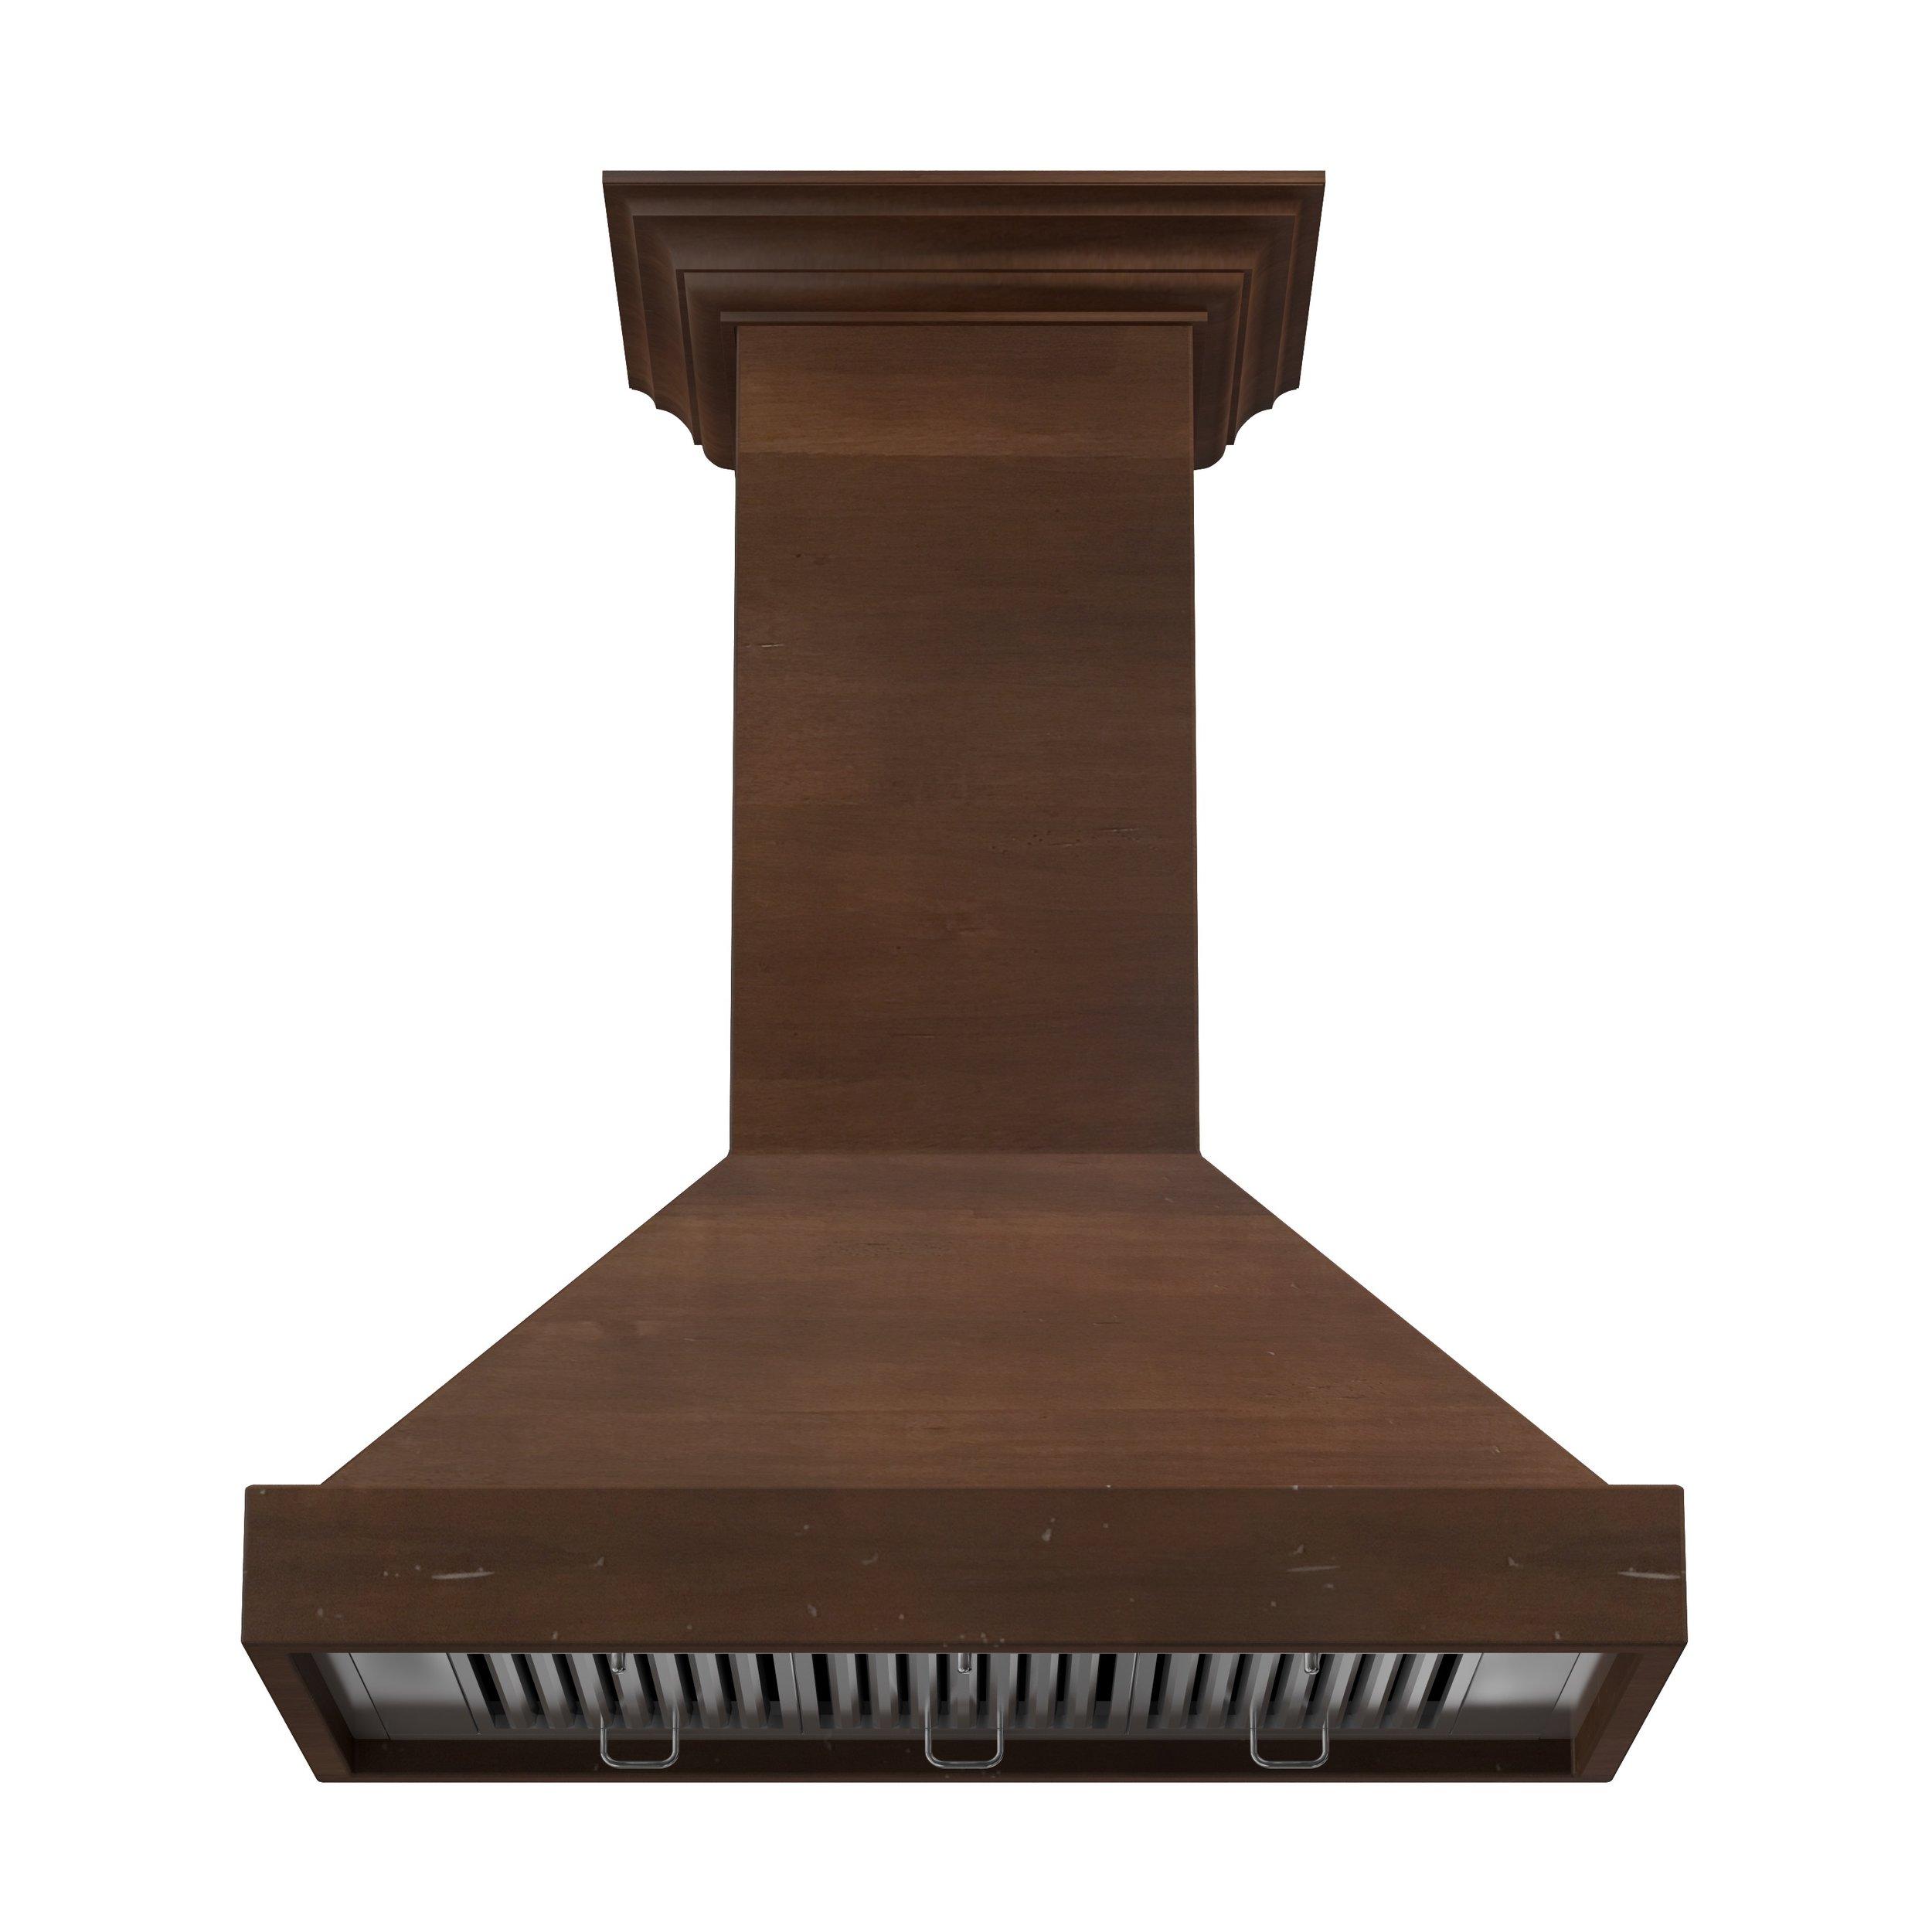 zline-designer-wood-range-hood-KBRR-under.jpg